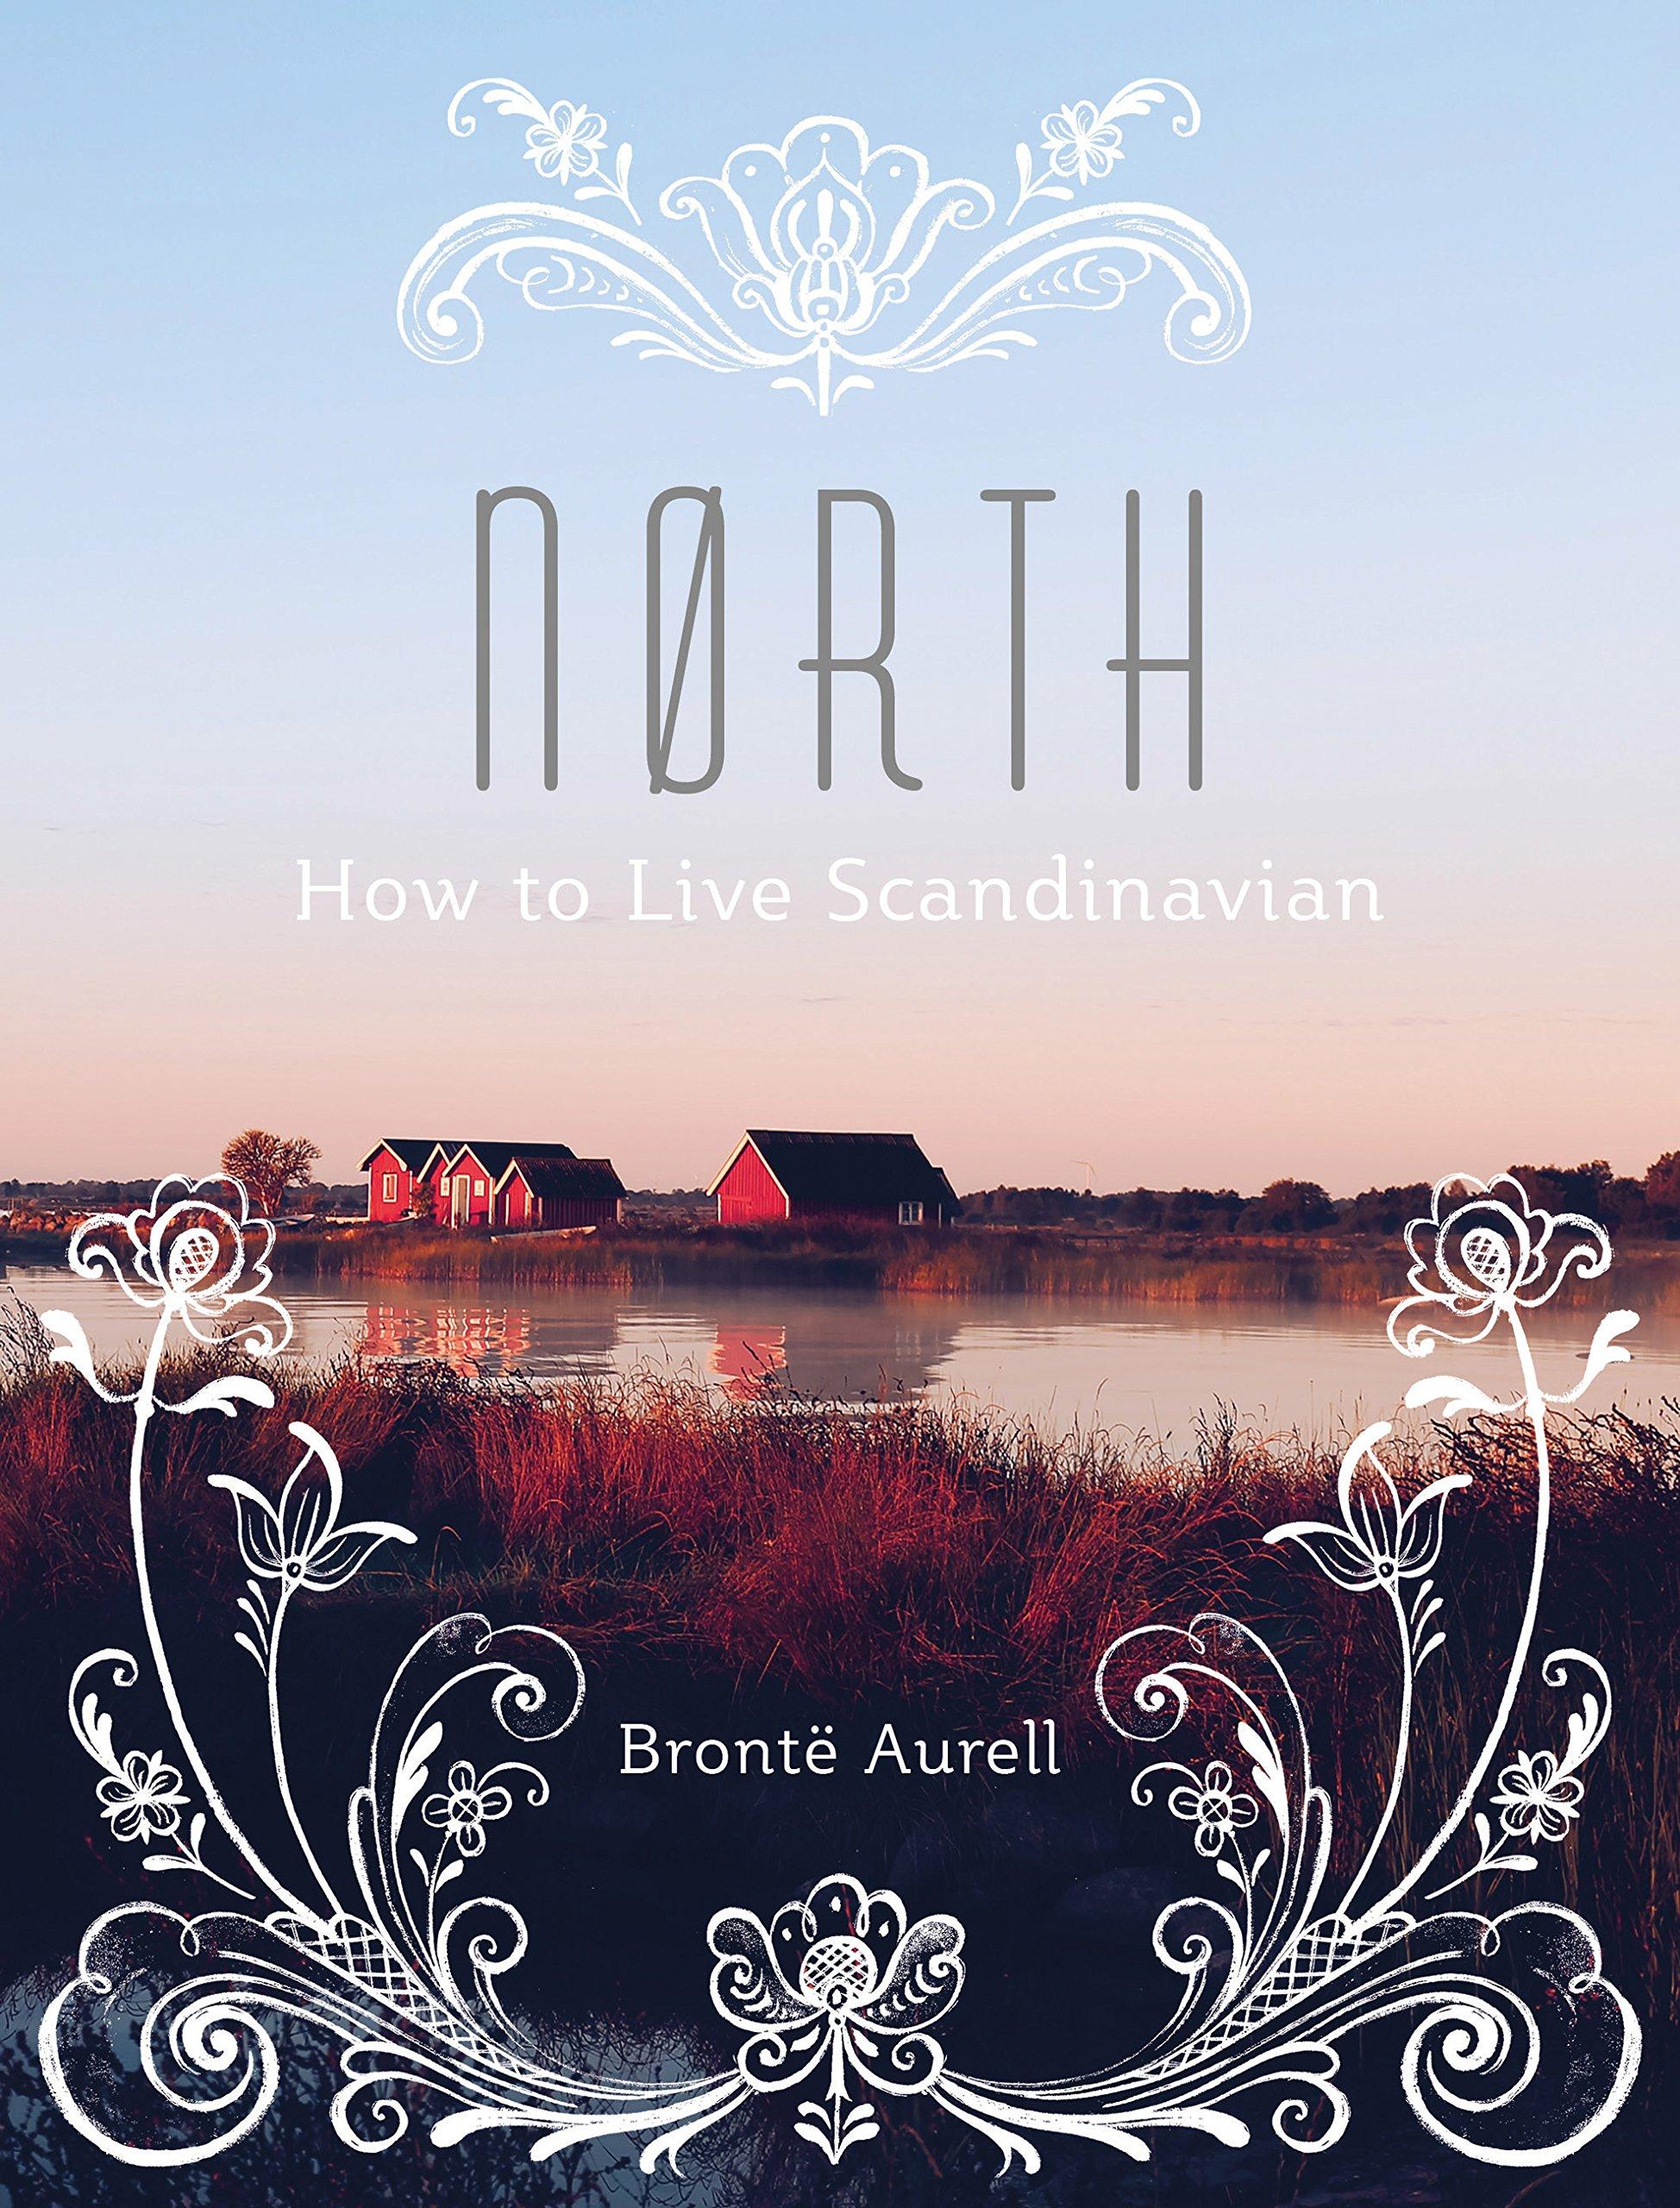 North: How to Live Scandinavian Hardcover – September 7, 2017 Bronte Aurell Aurum Press 178131652X Healthy Living